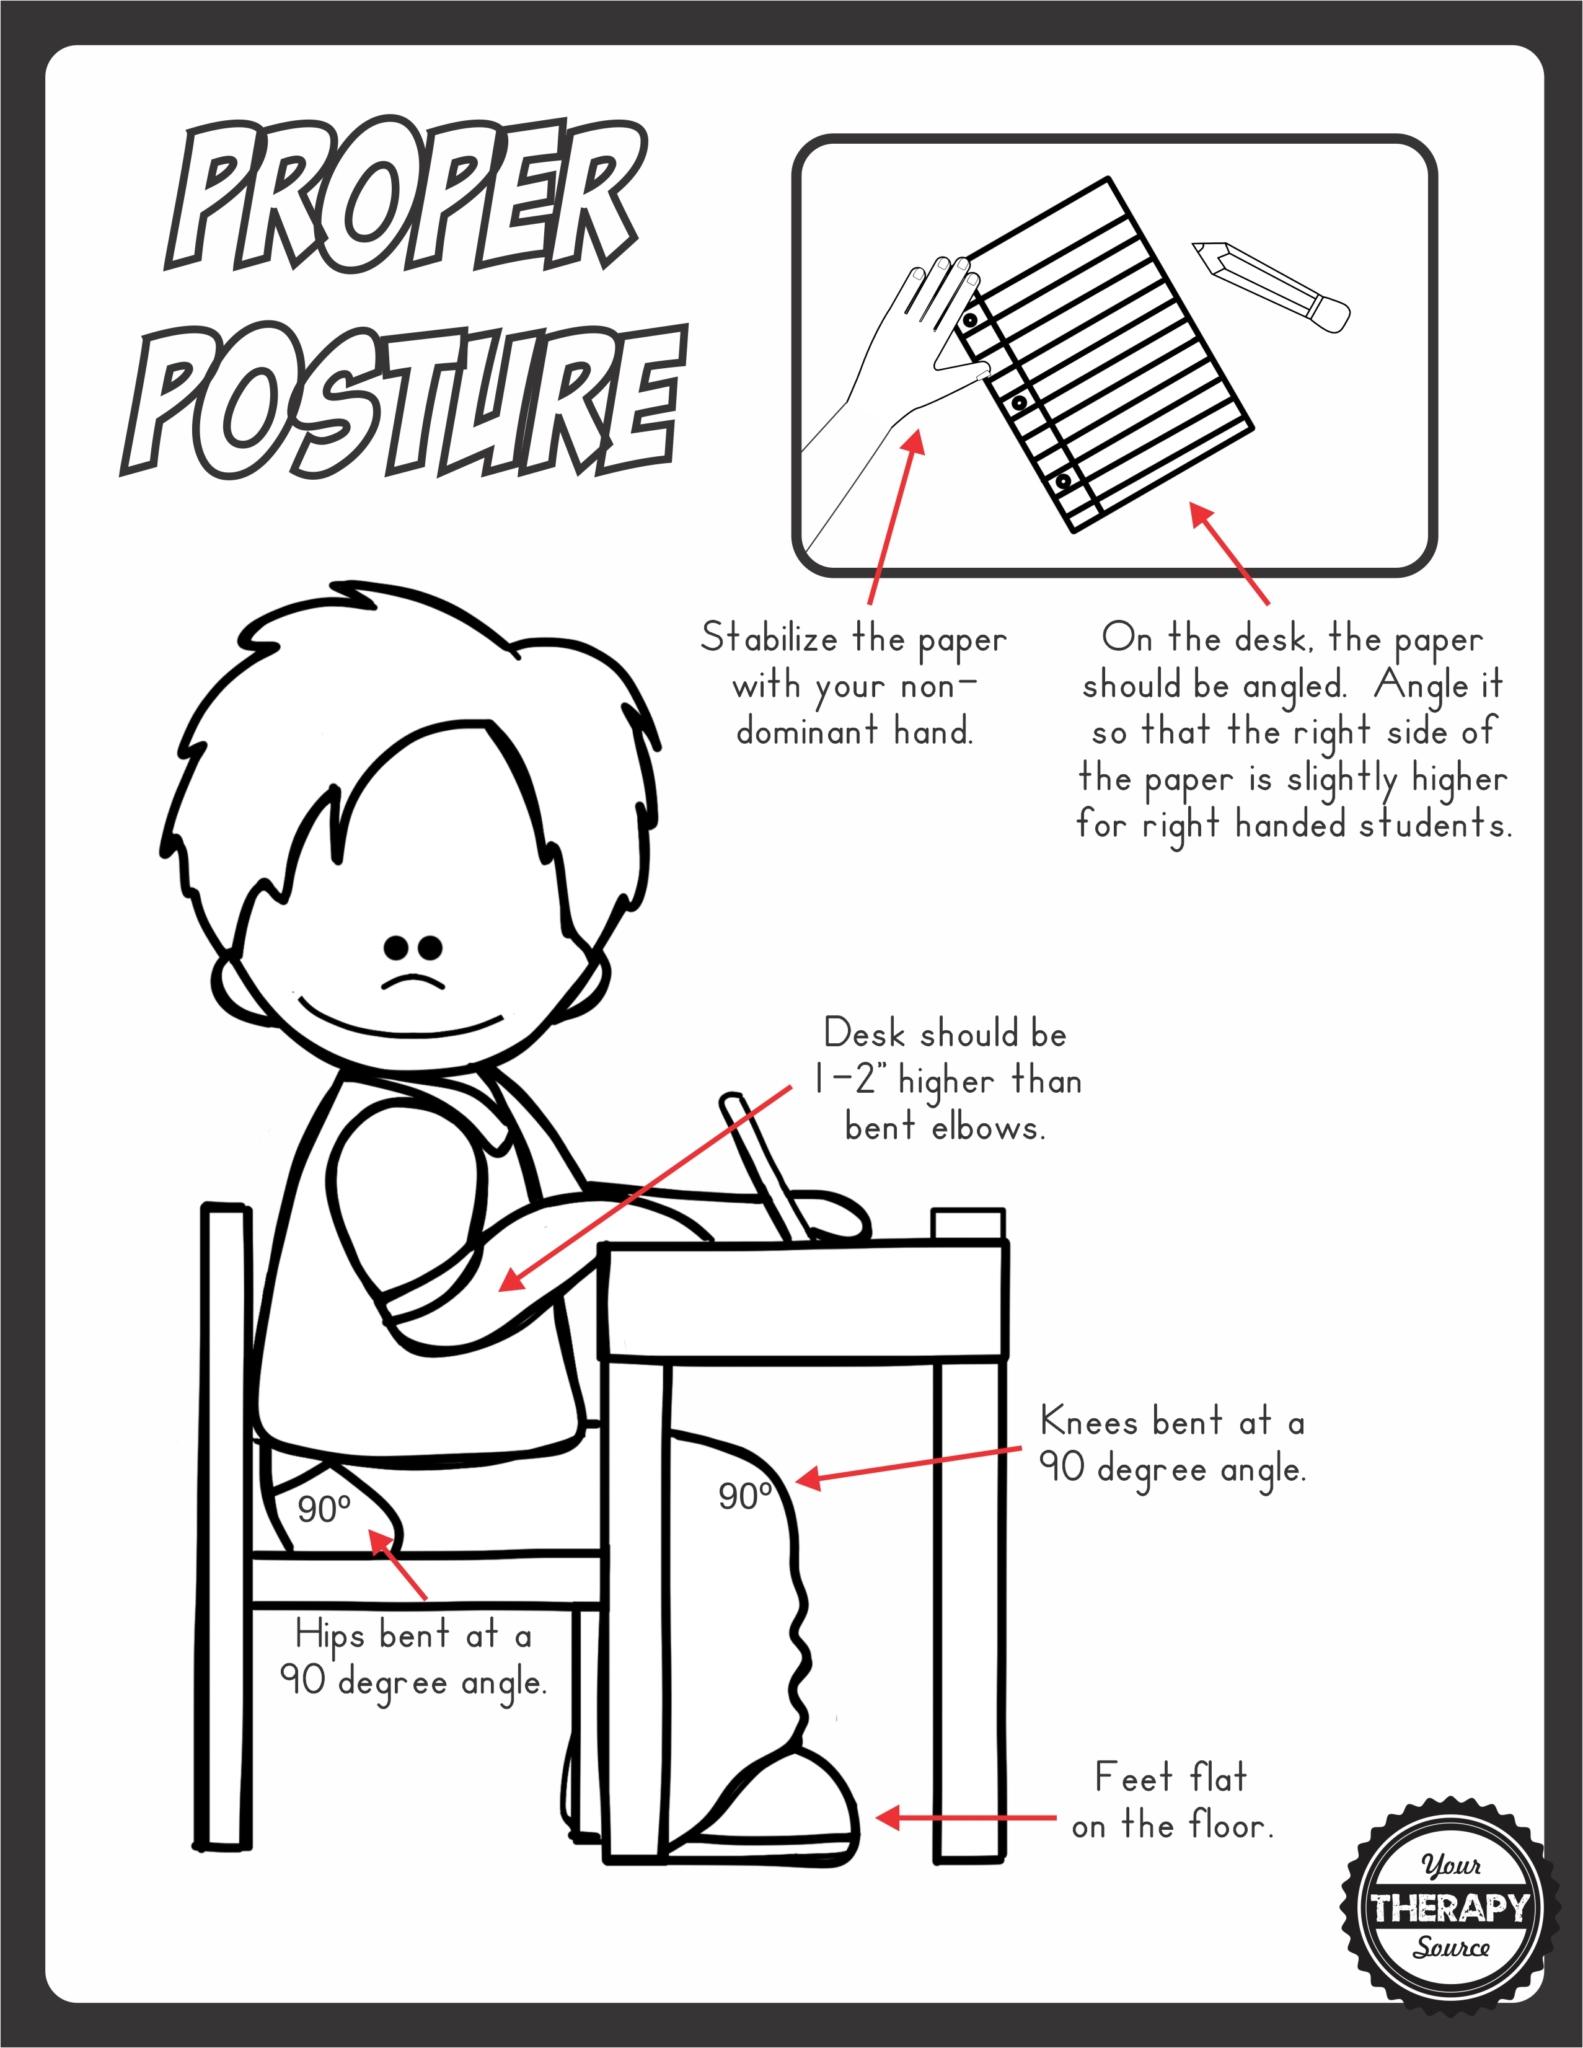 Proper Posture Functional Skills for Kids